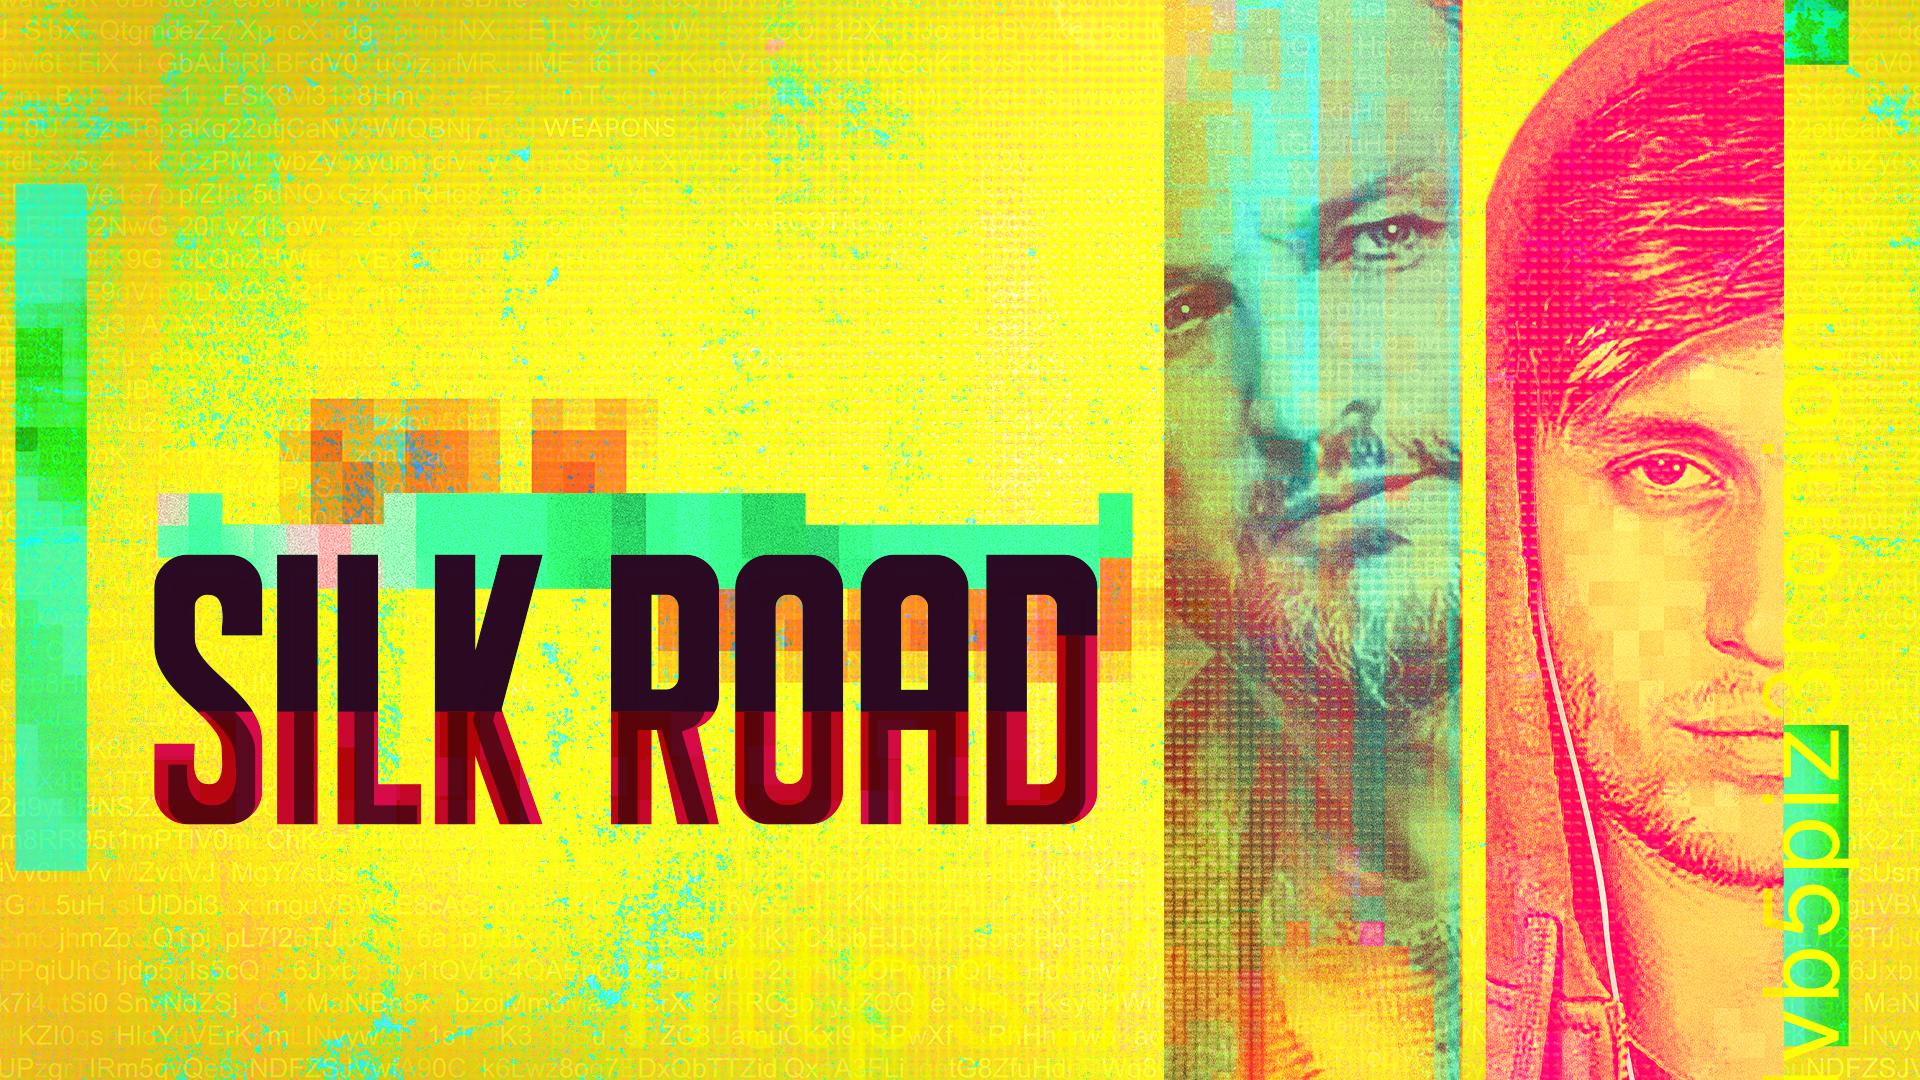 Silk Road (2020)